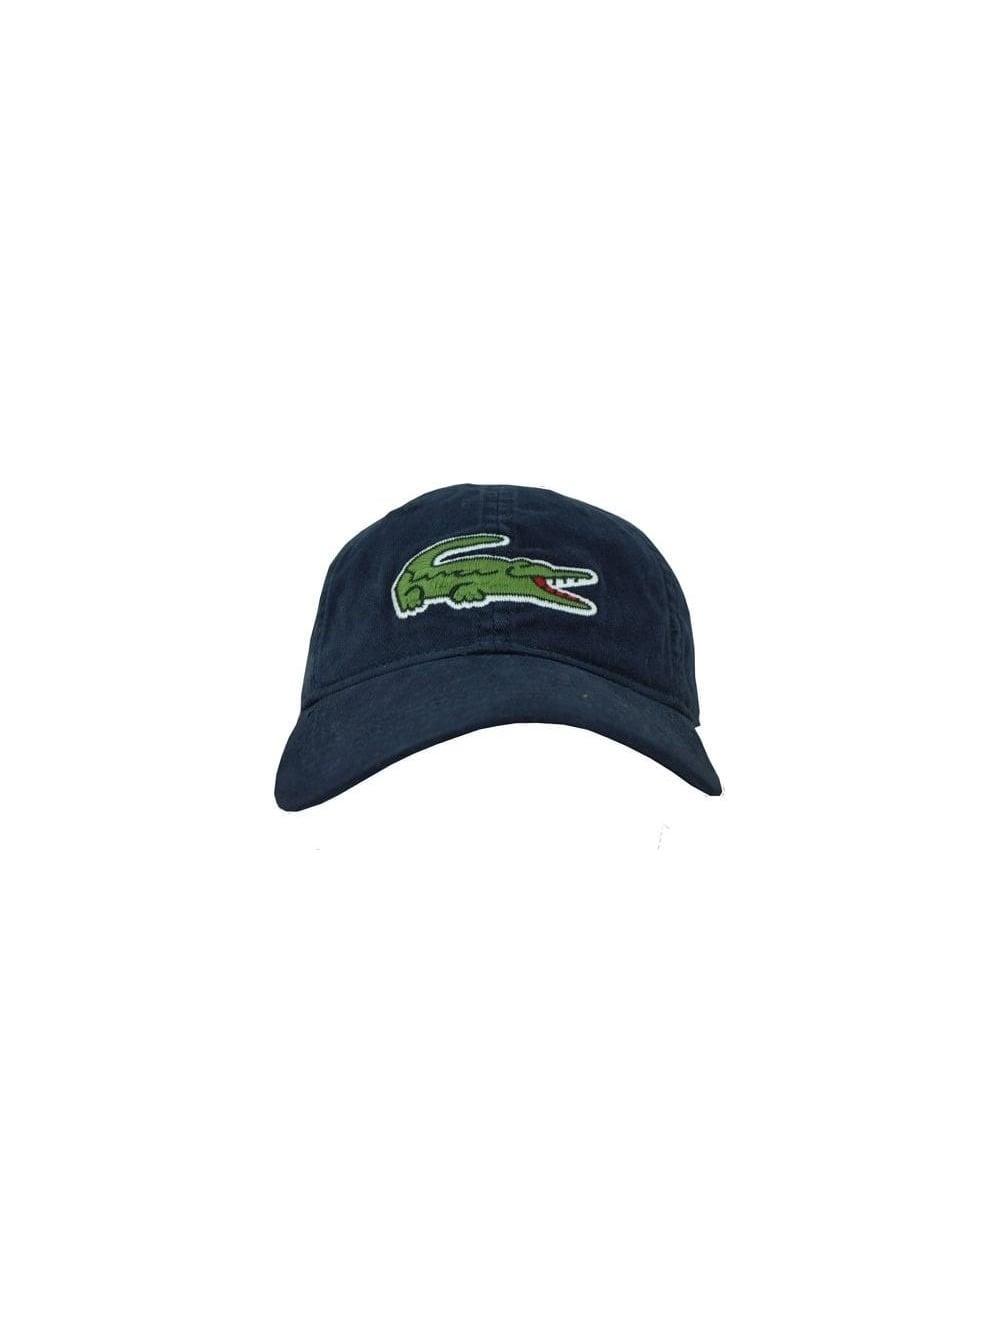 Lacoste Sport Oversized Croc Logo Cap in Eclipse - Northern Threads a87b6211e141